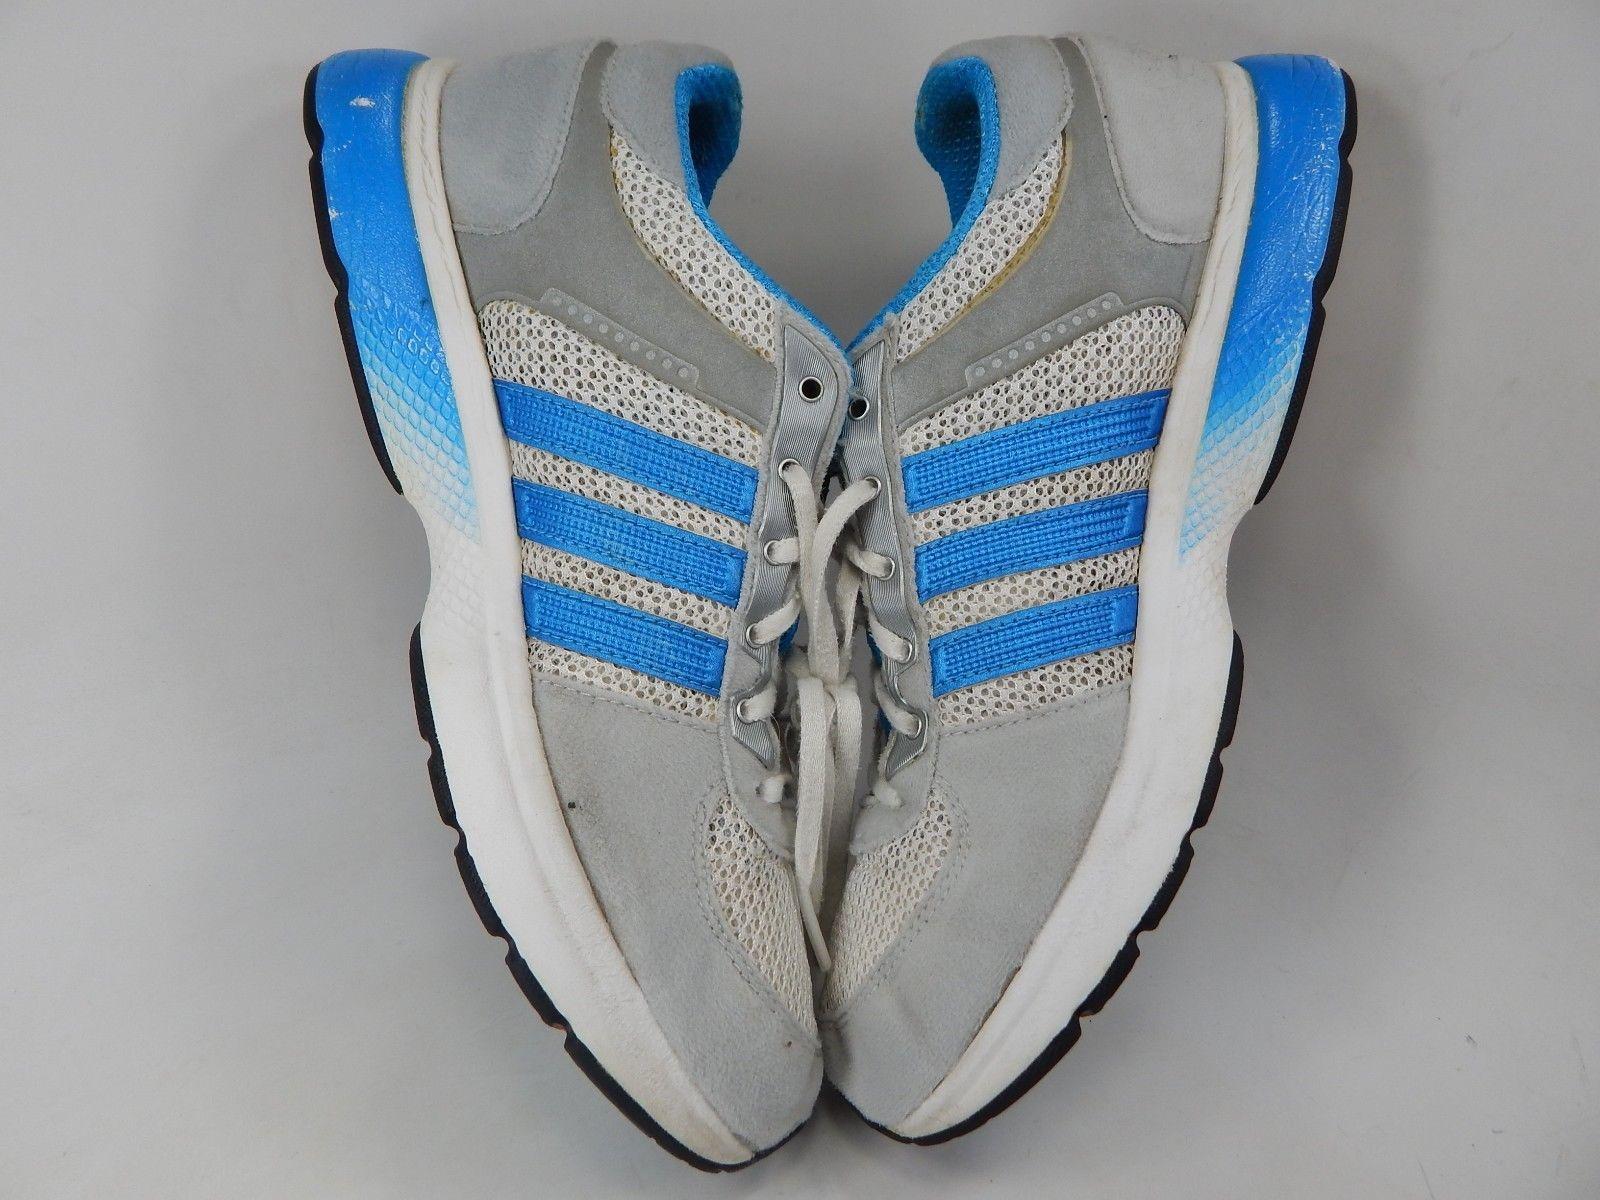 Adidas Atlanta 10 Size 9.5 M (B) EU 42 Women's Running Shoes Gray Blue G20274